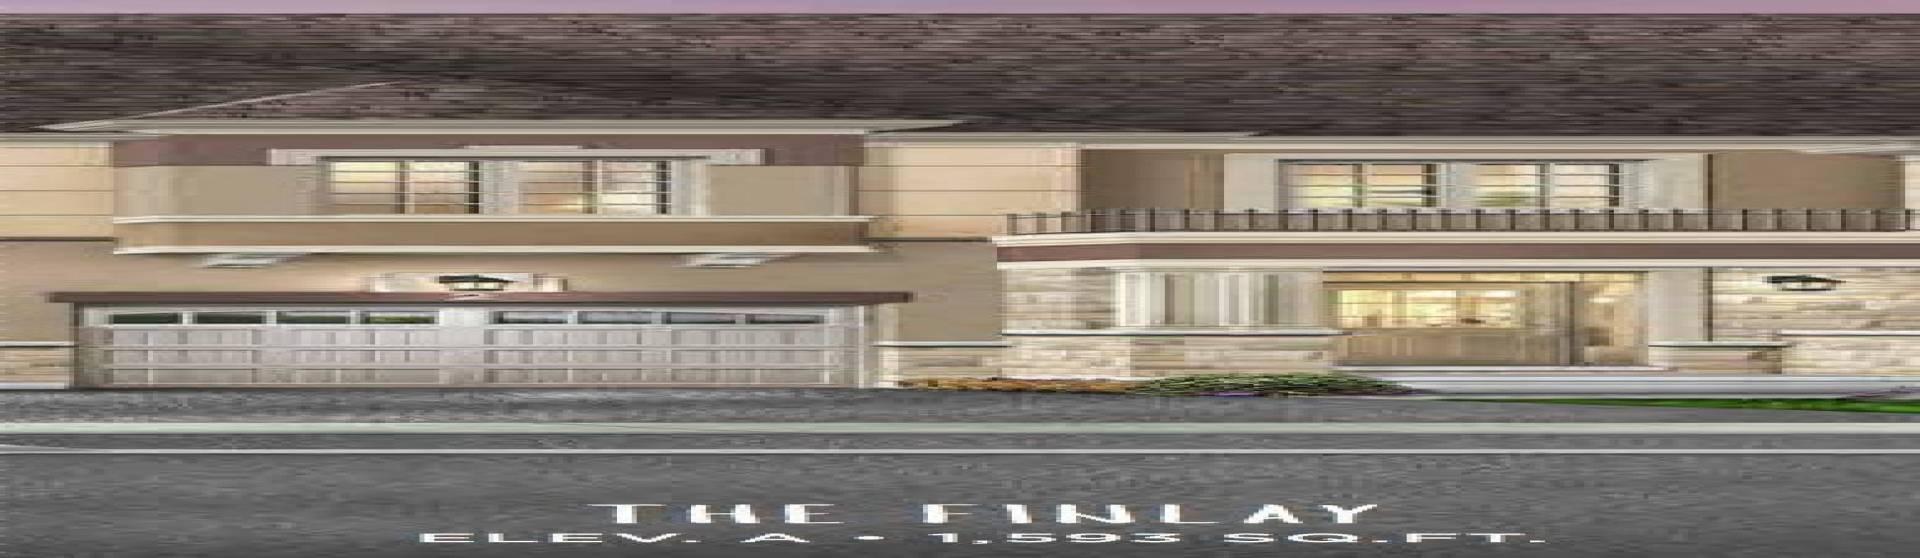 75 Bilanski Farm Rd- Brantford- Ontario N3S 0J6, 3 Bedrooms Bedrooms, 7 Rooms Rooms,3 BathroomsBathrooms,Att/row/twnhouse,Sale,Bilanski Farm,X4753195